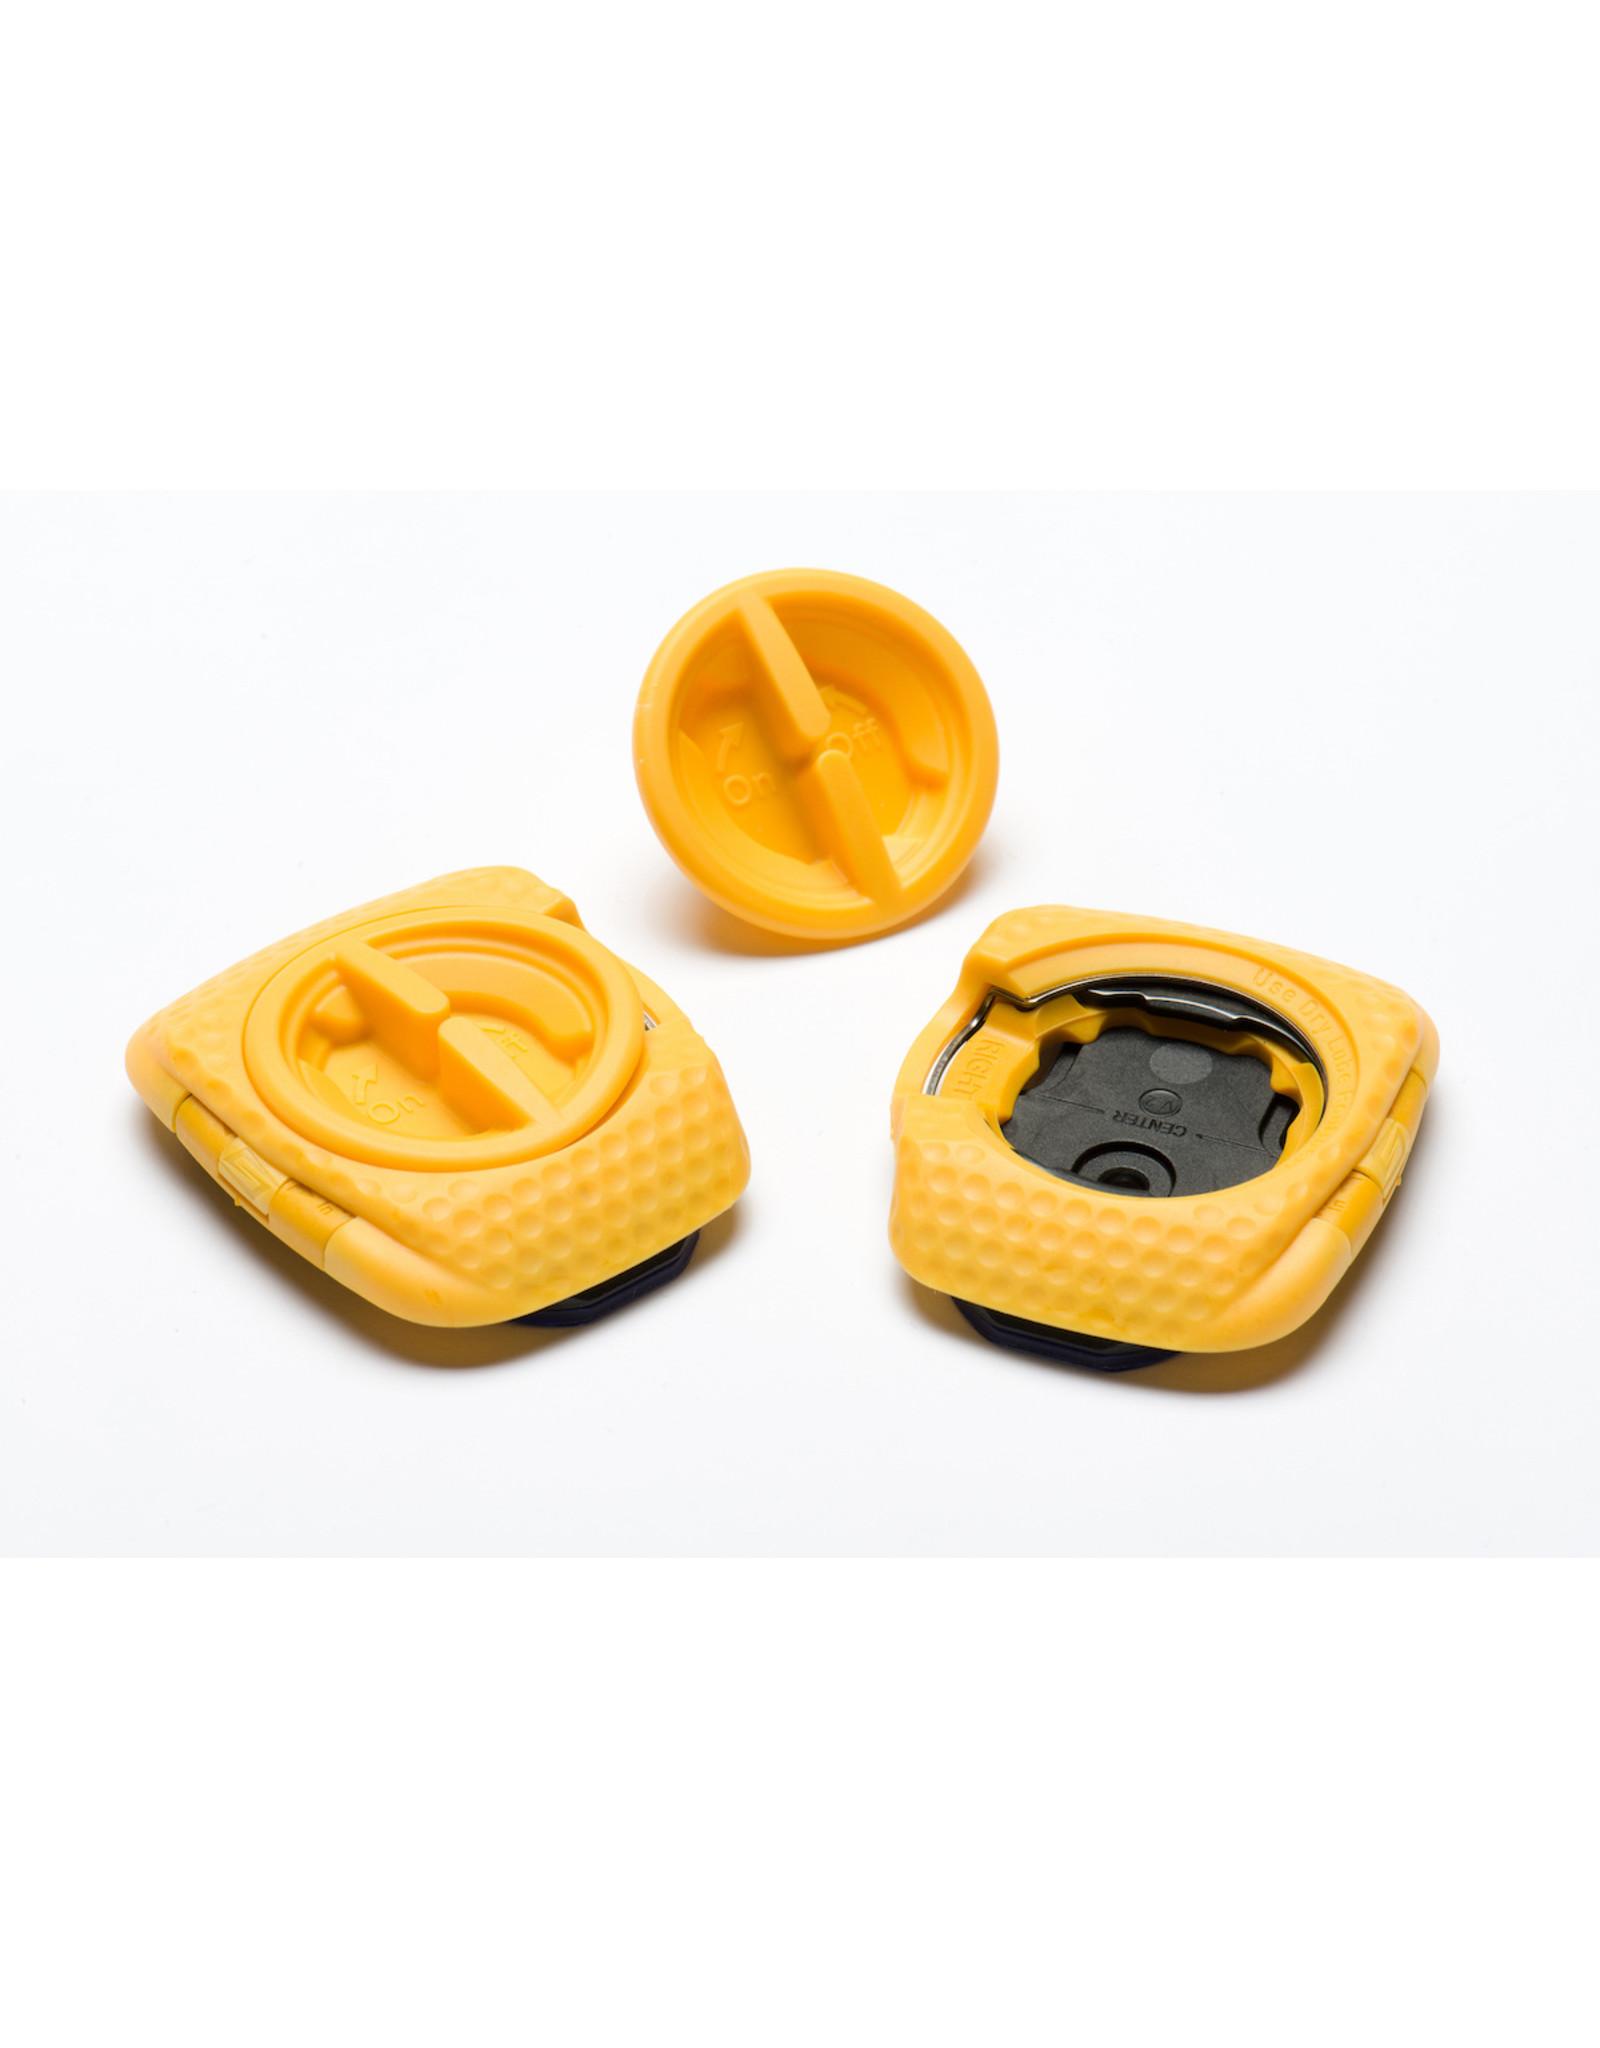 Speedplay Speedplay Zero Aero Walkable Cleats Yellow